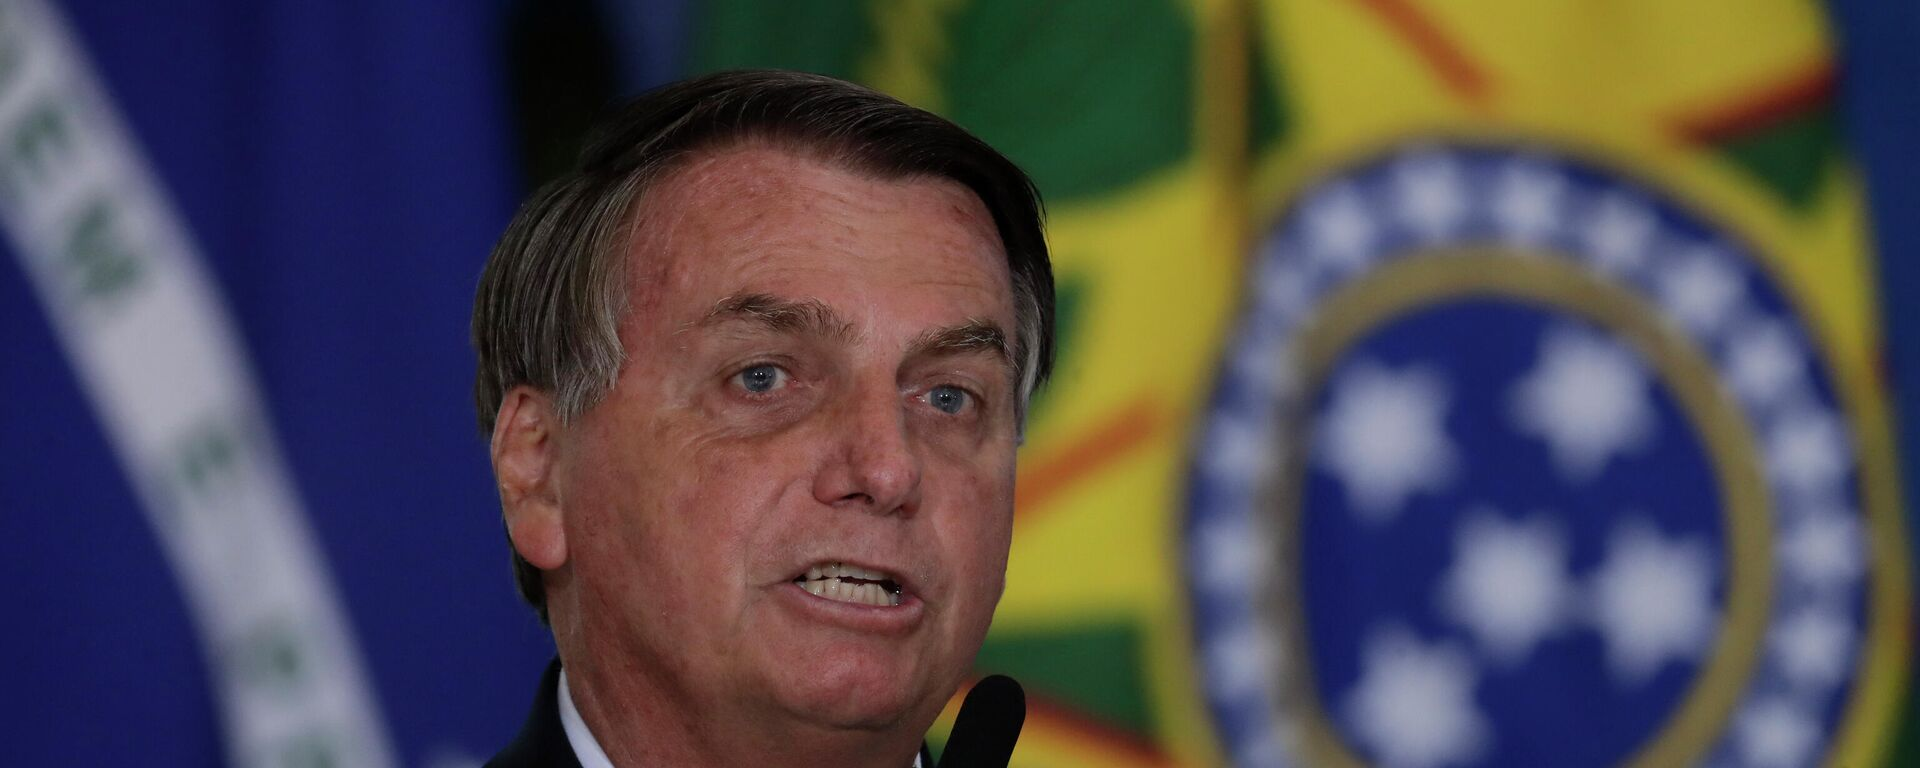 Brasilianischer Präsident Jair Bolsonaro  - SNA, 1920, 28.08.2021